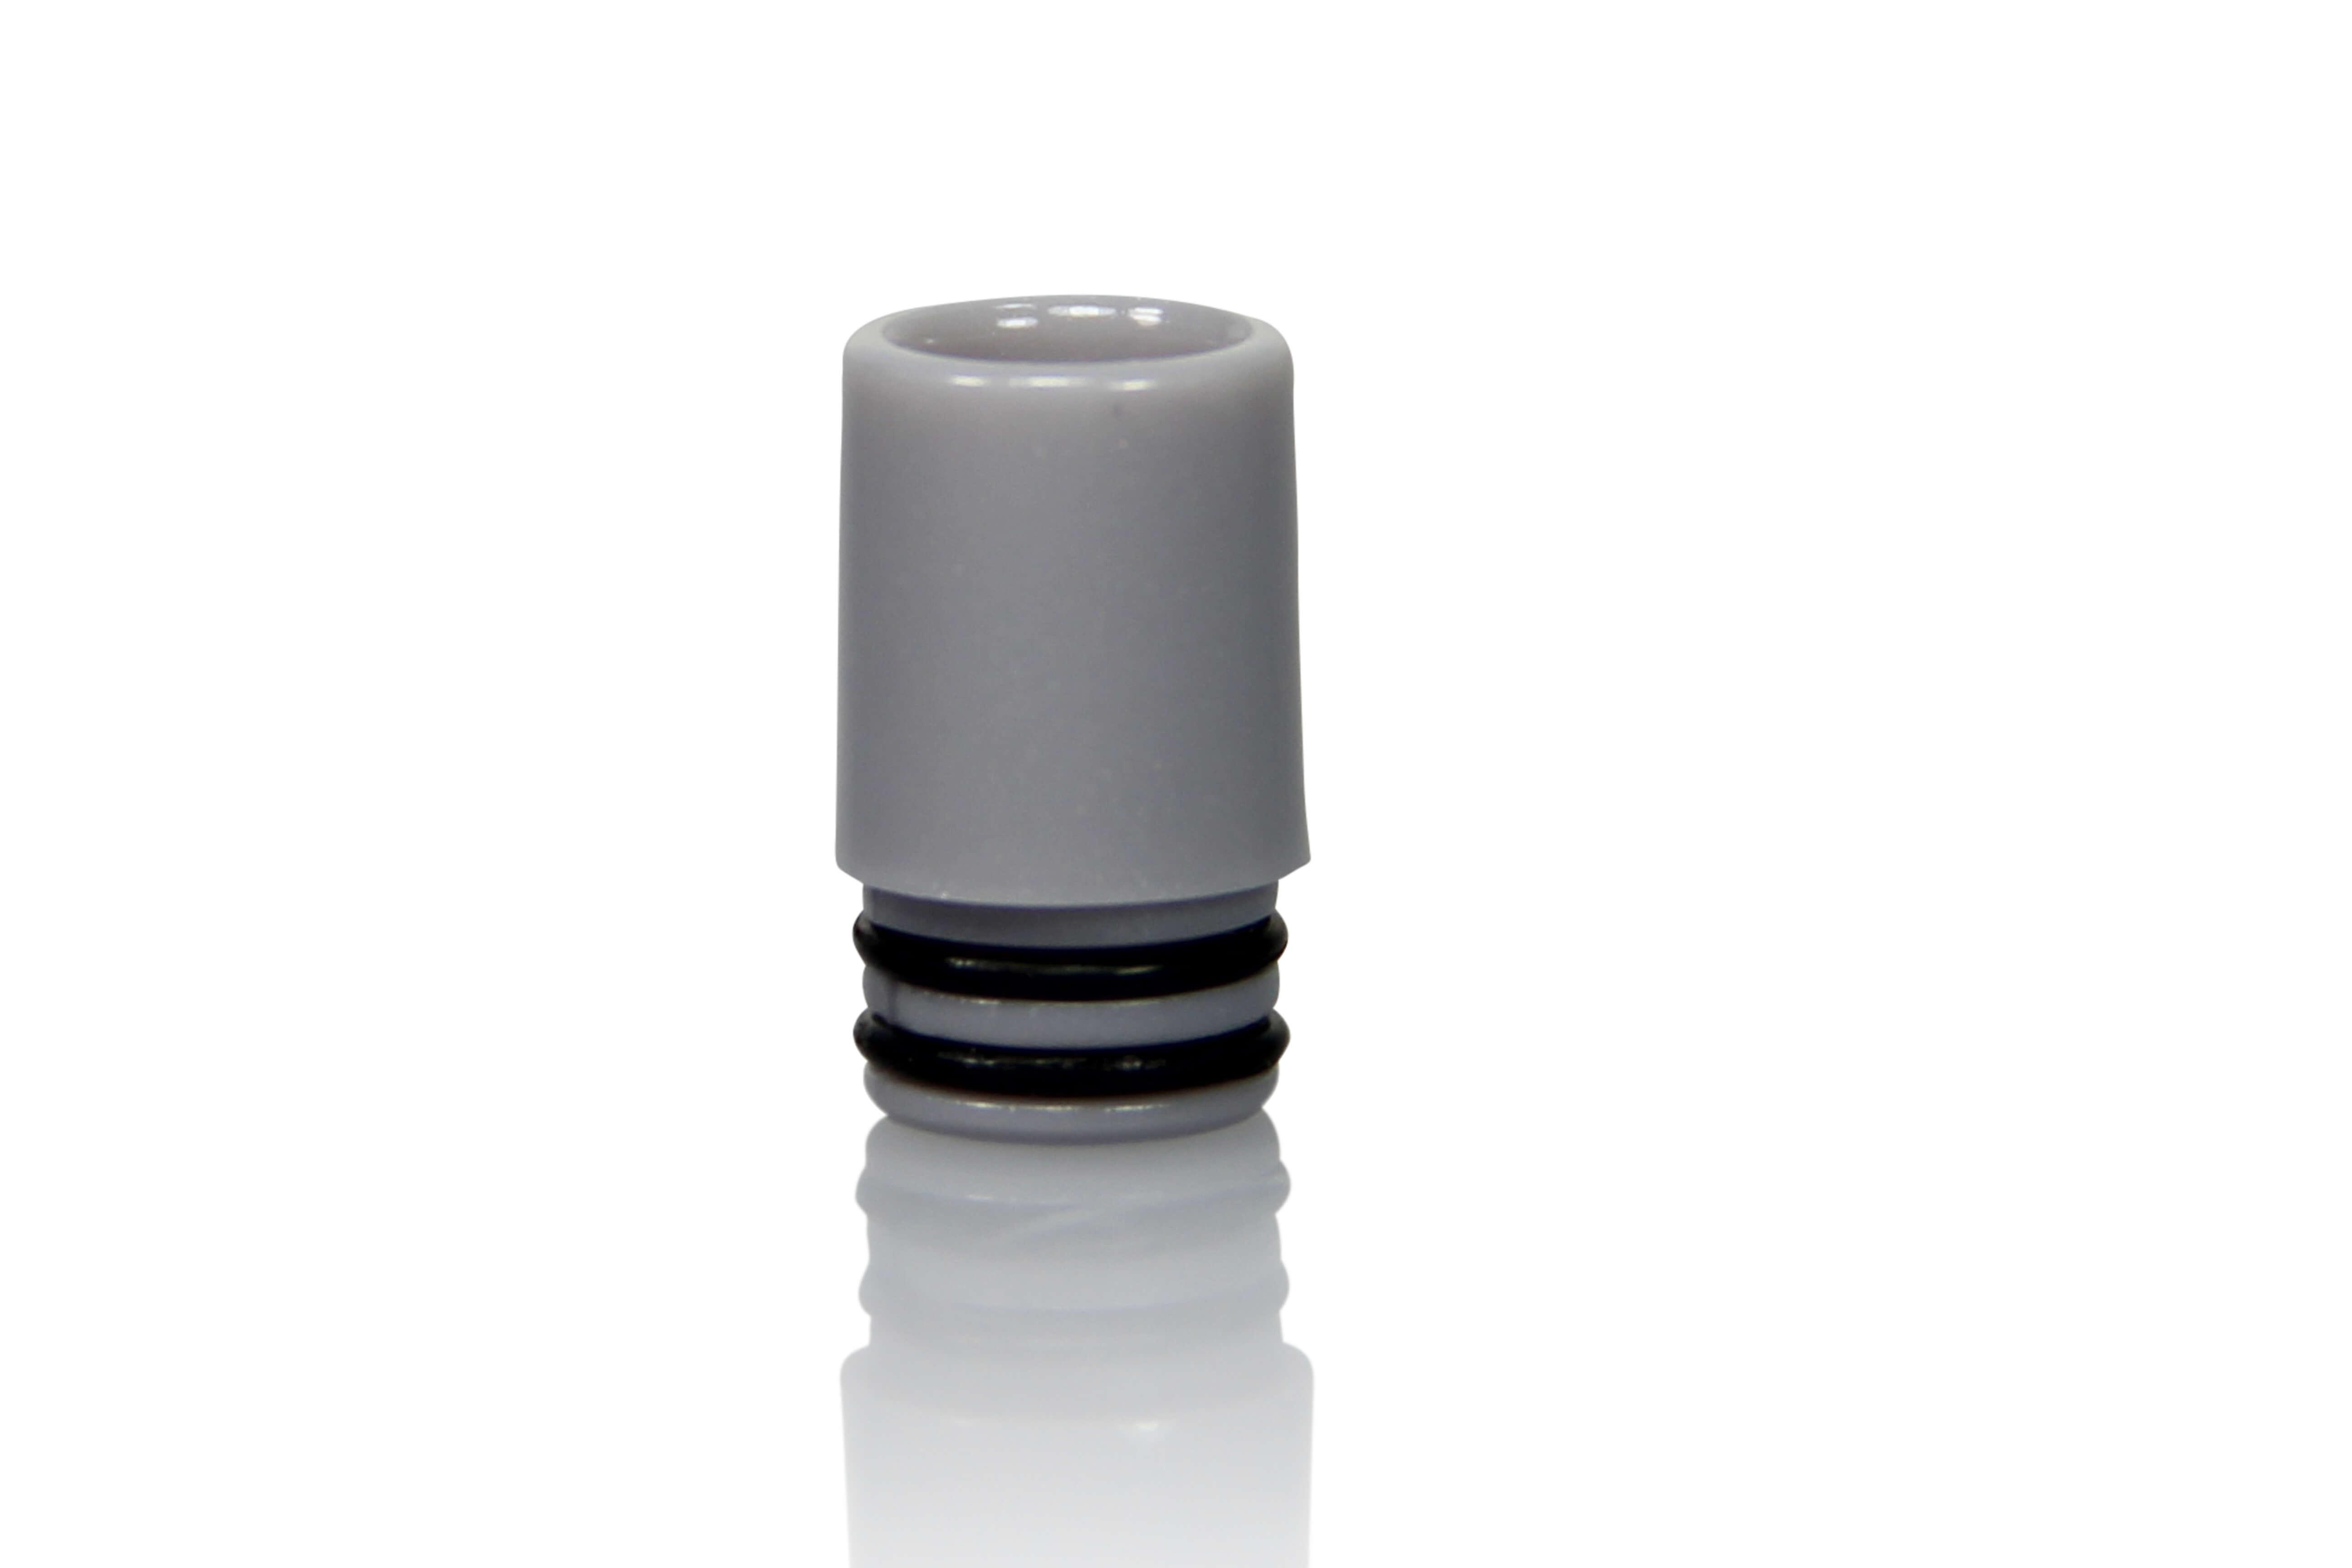 InnoCigs Spiral Mundstück grau (5 Stück pro Packung)